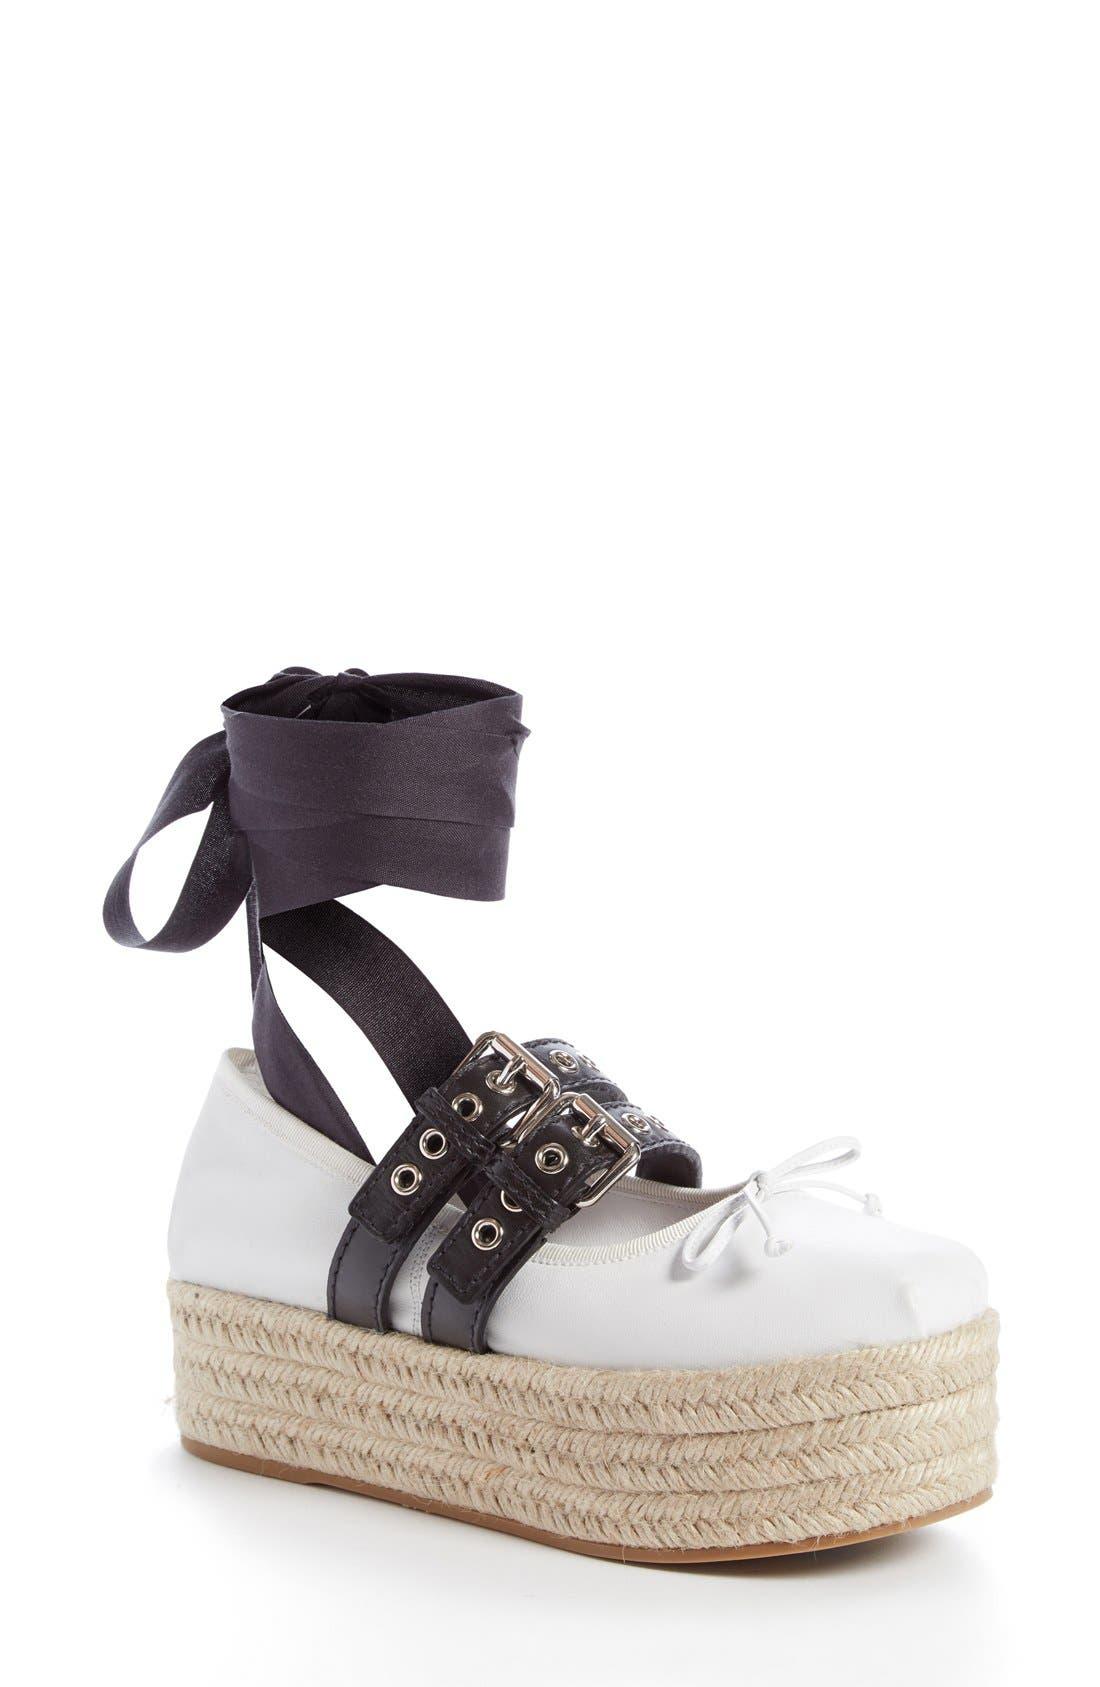 Miu Miu Ankle Wrap Platform Espadrille (Women)